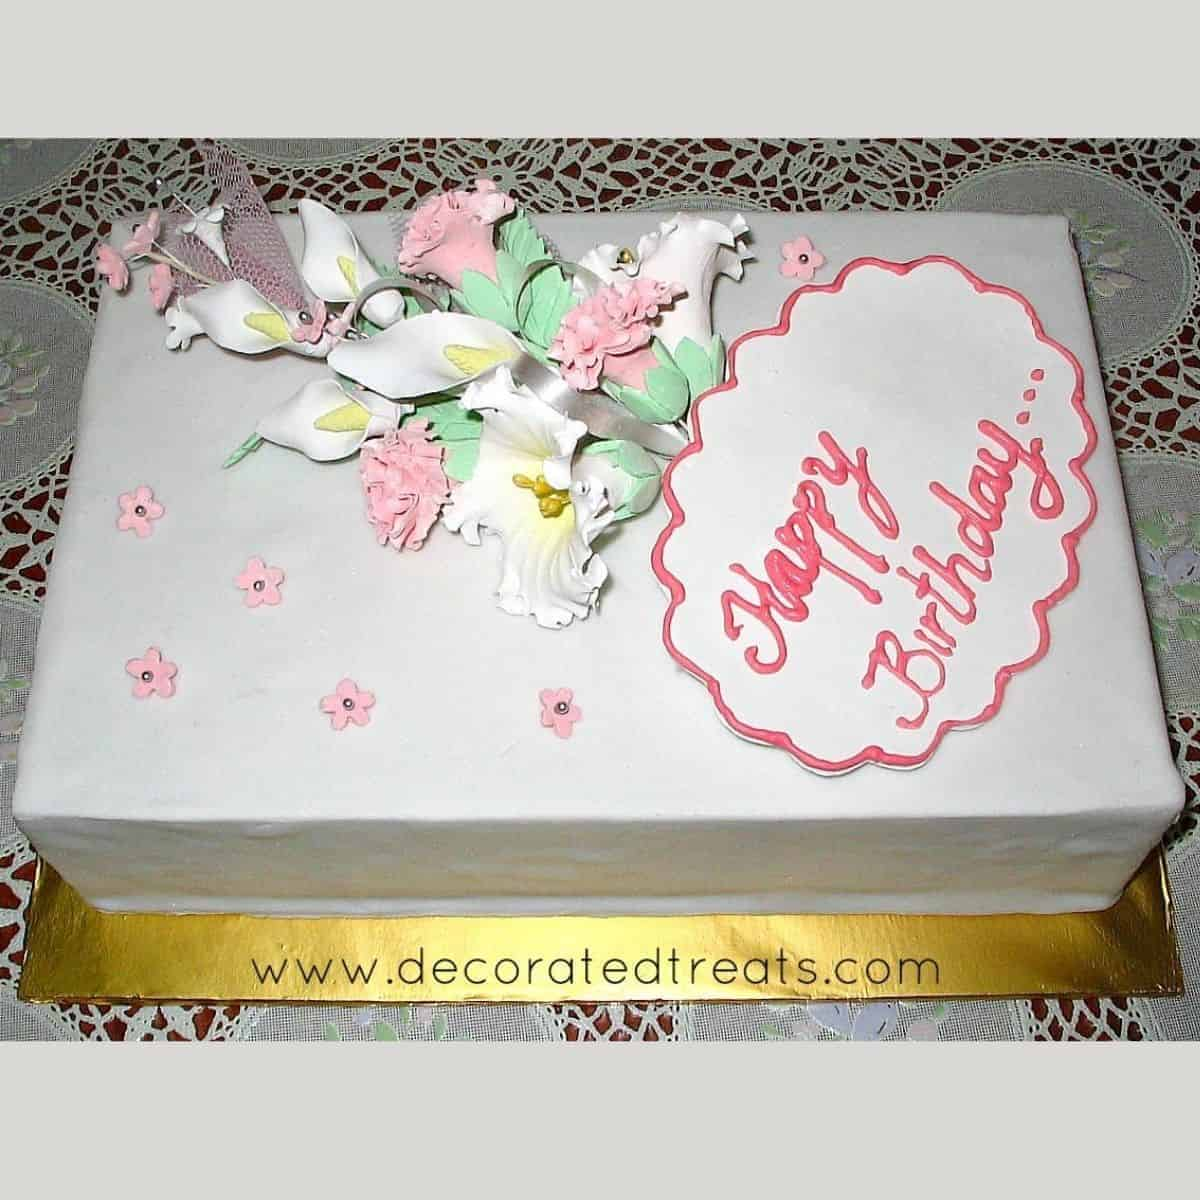 Floral Bouquet Cake Decorating Idea Decorated Treats